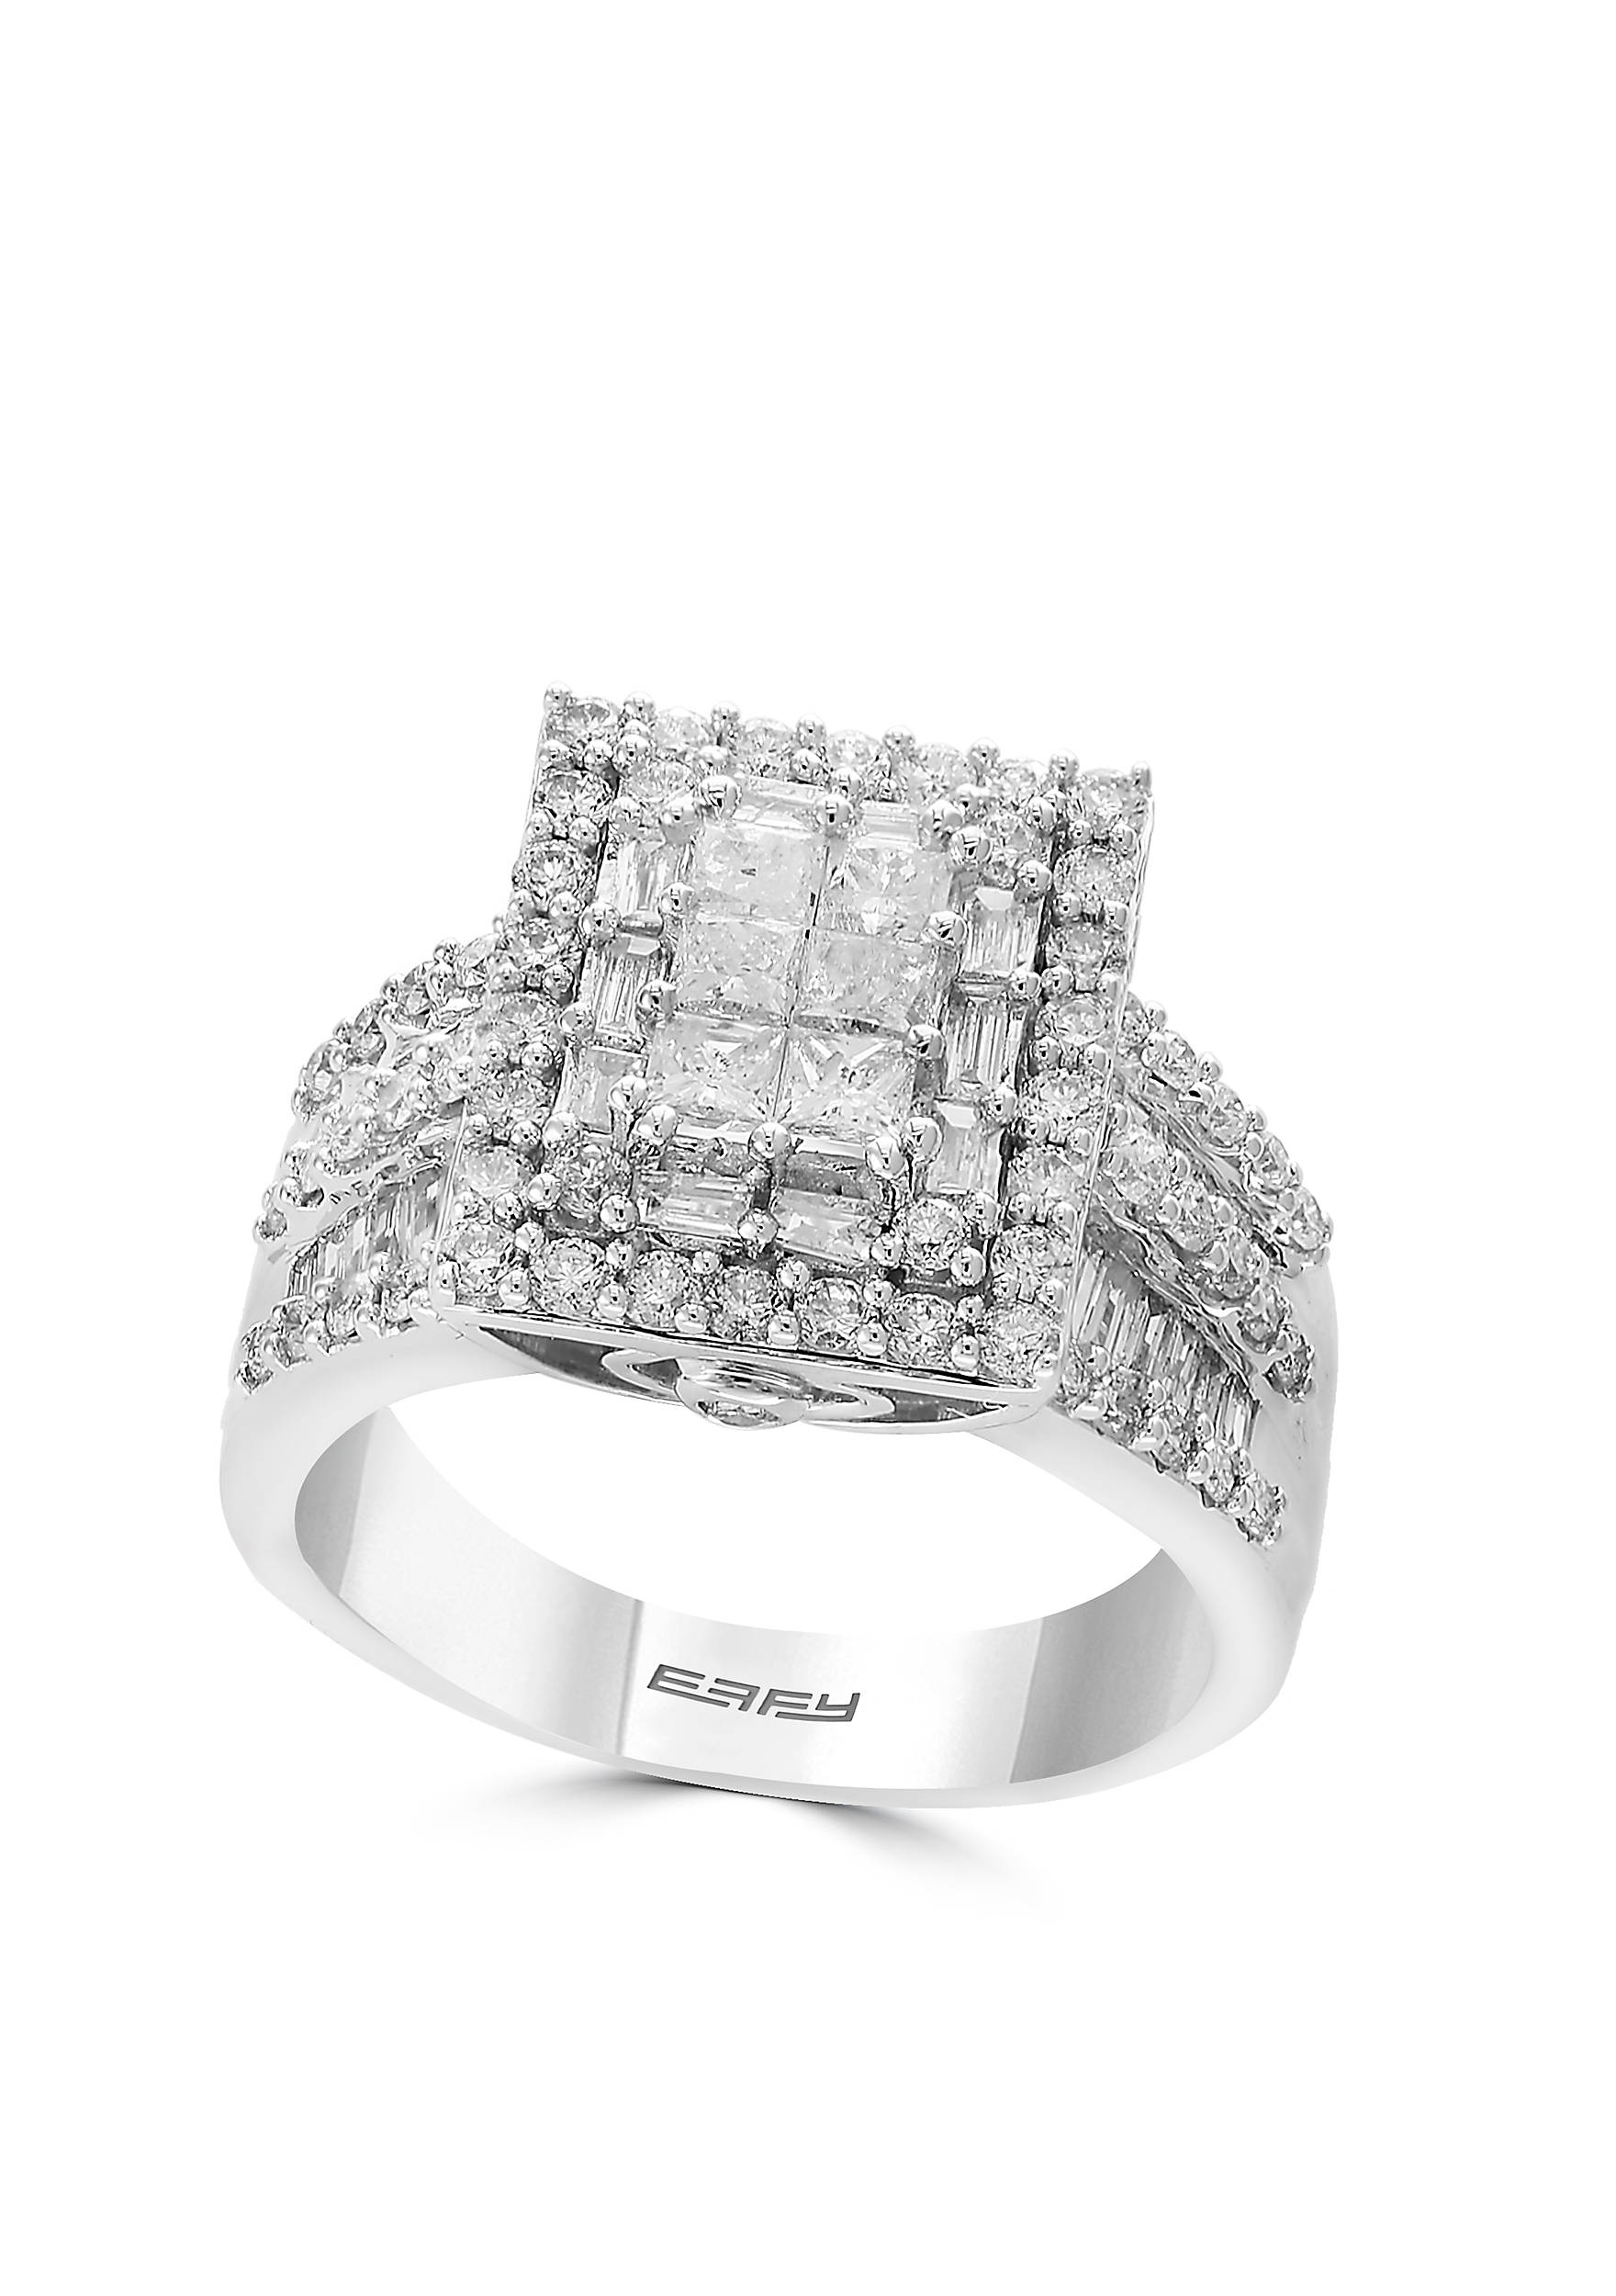 Effy® 2.0 ct. t.w. Diamond Cluster Ring in 14K White Gold | belk